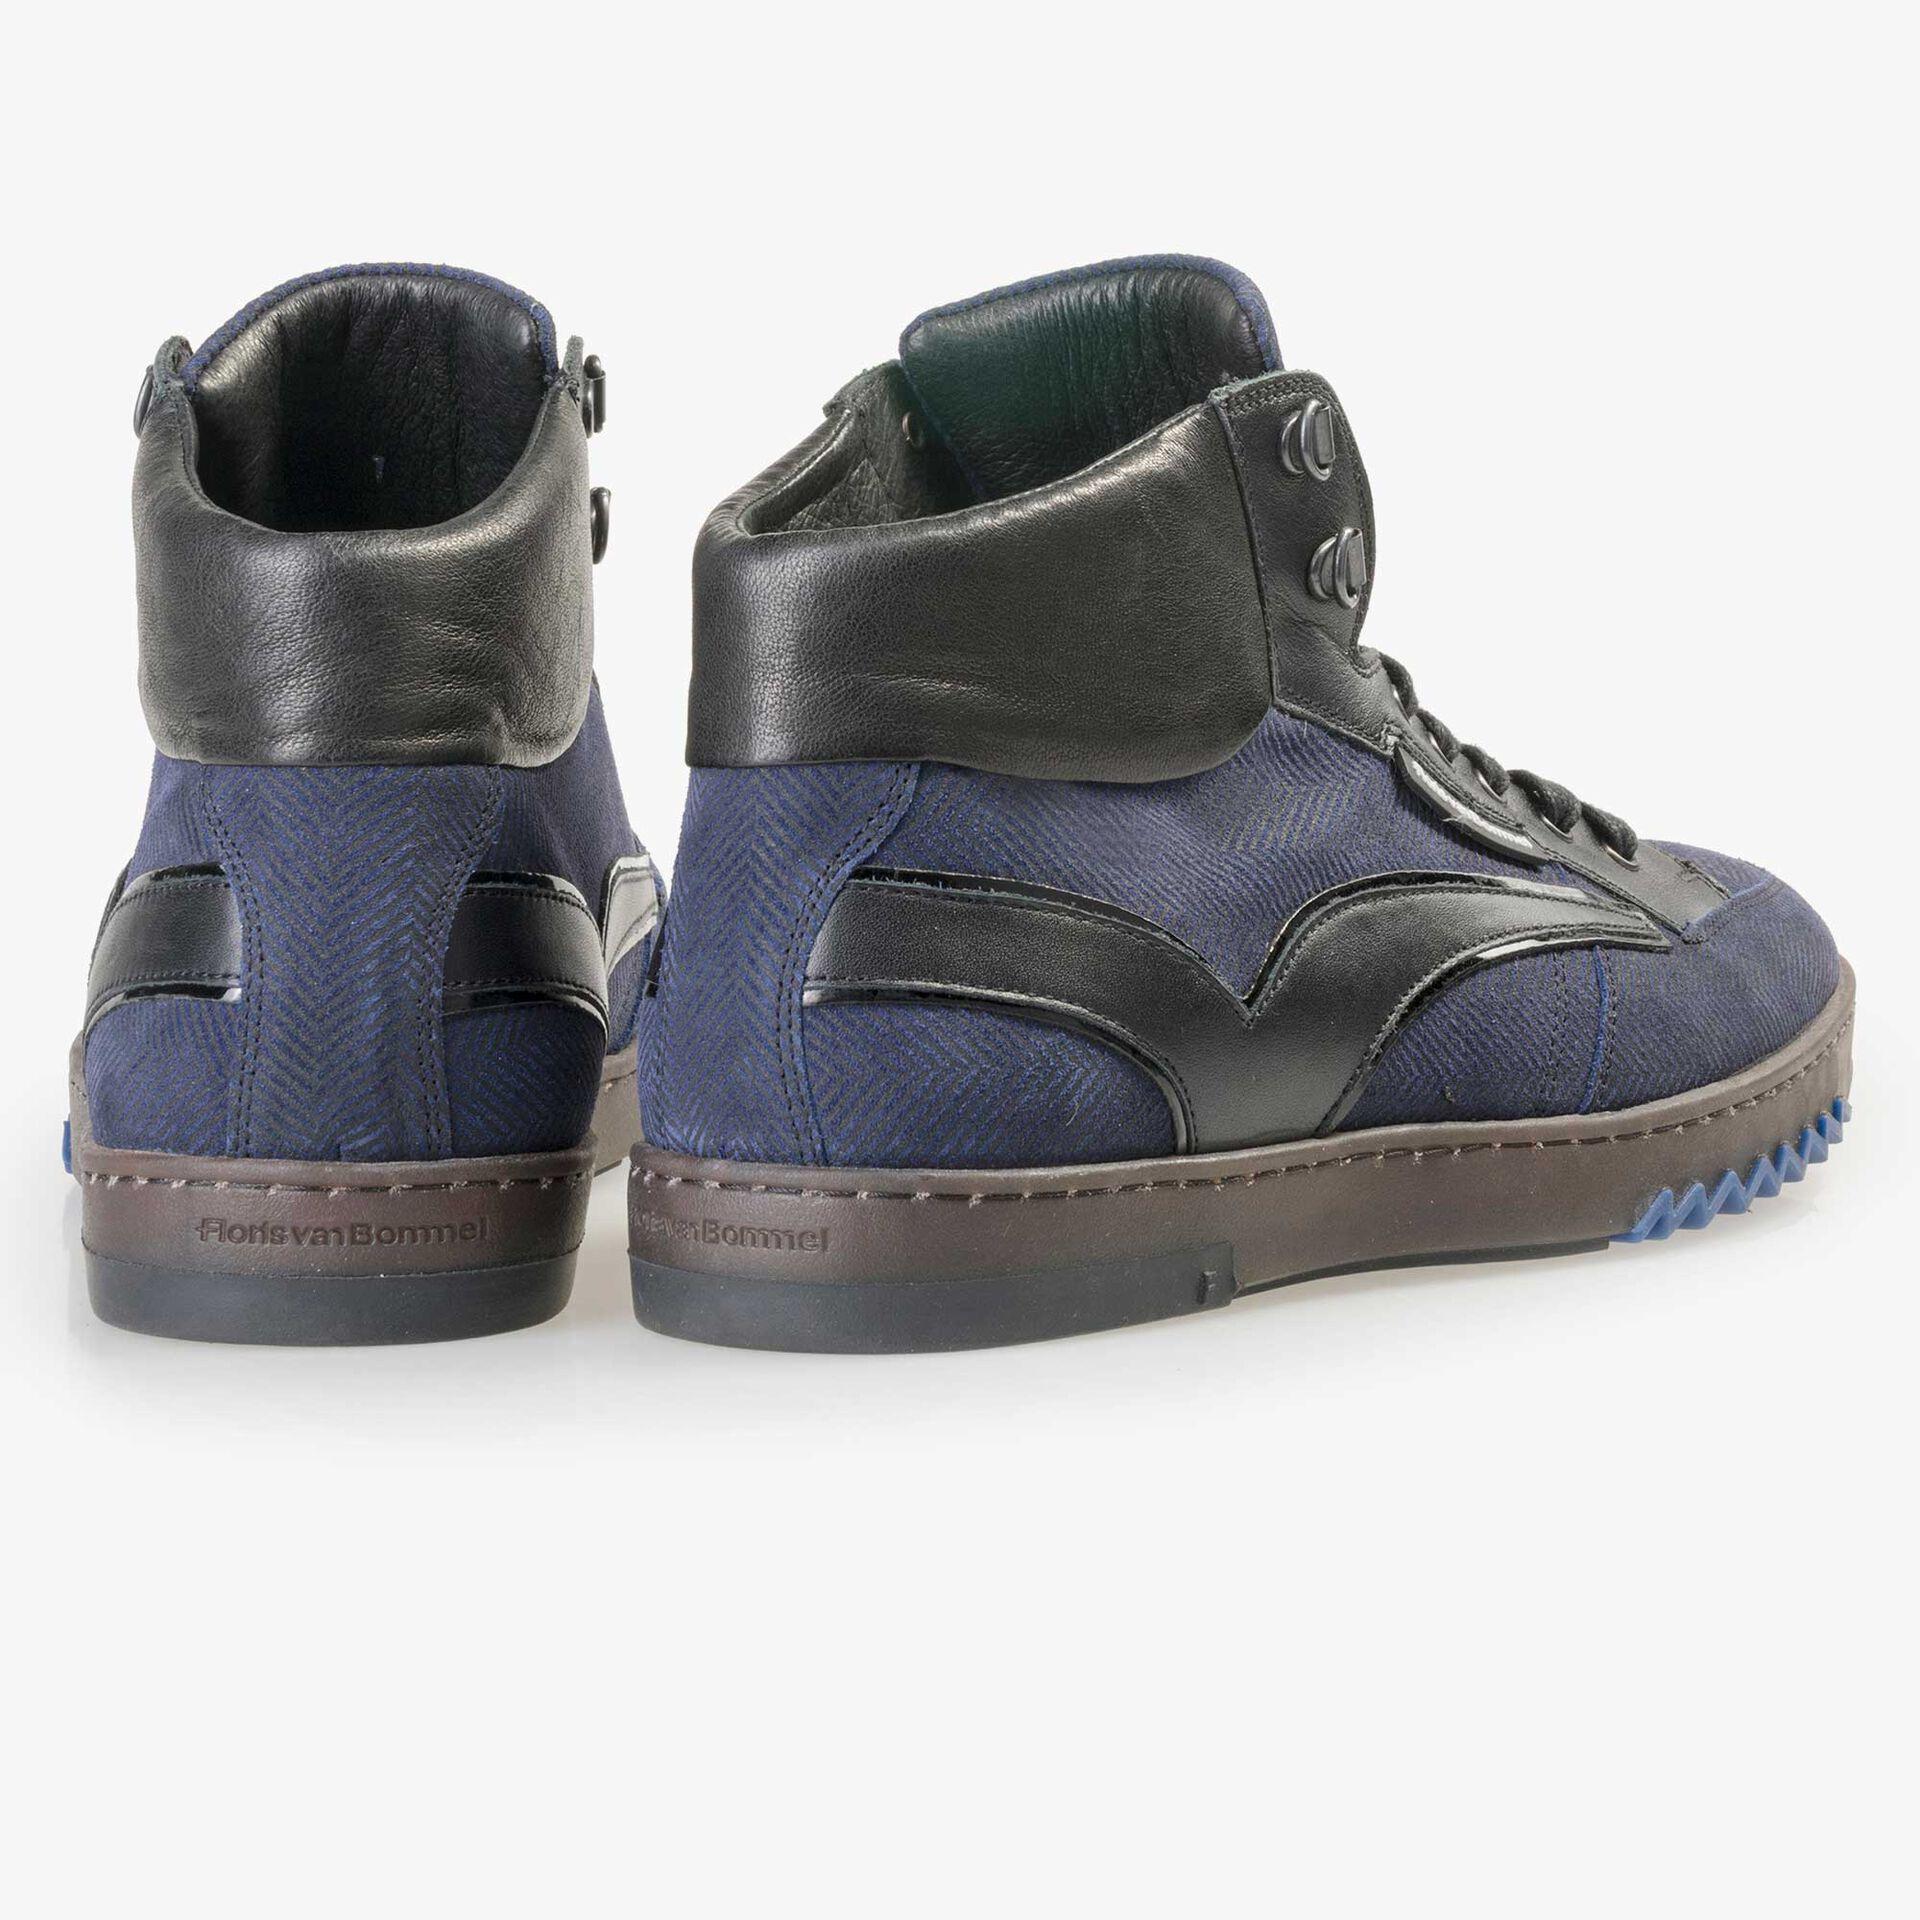 Floris van Bommel men's mid-high, blue suede leather sneaker